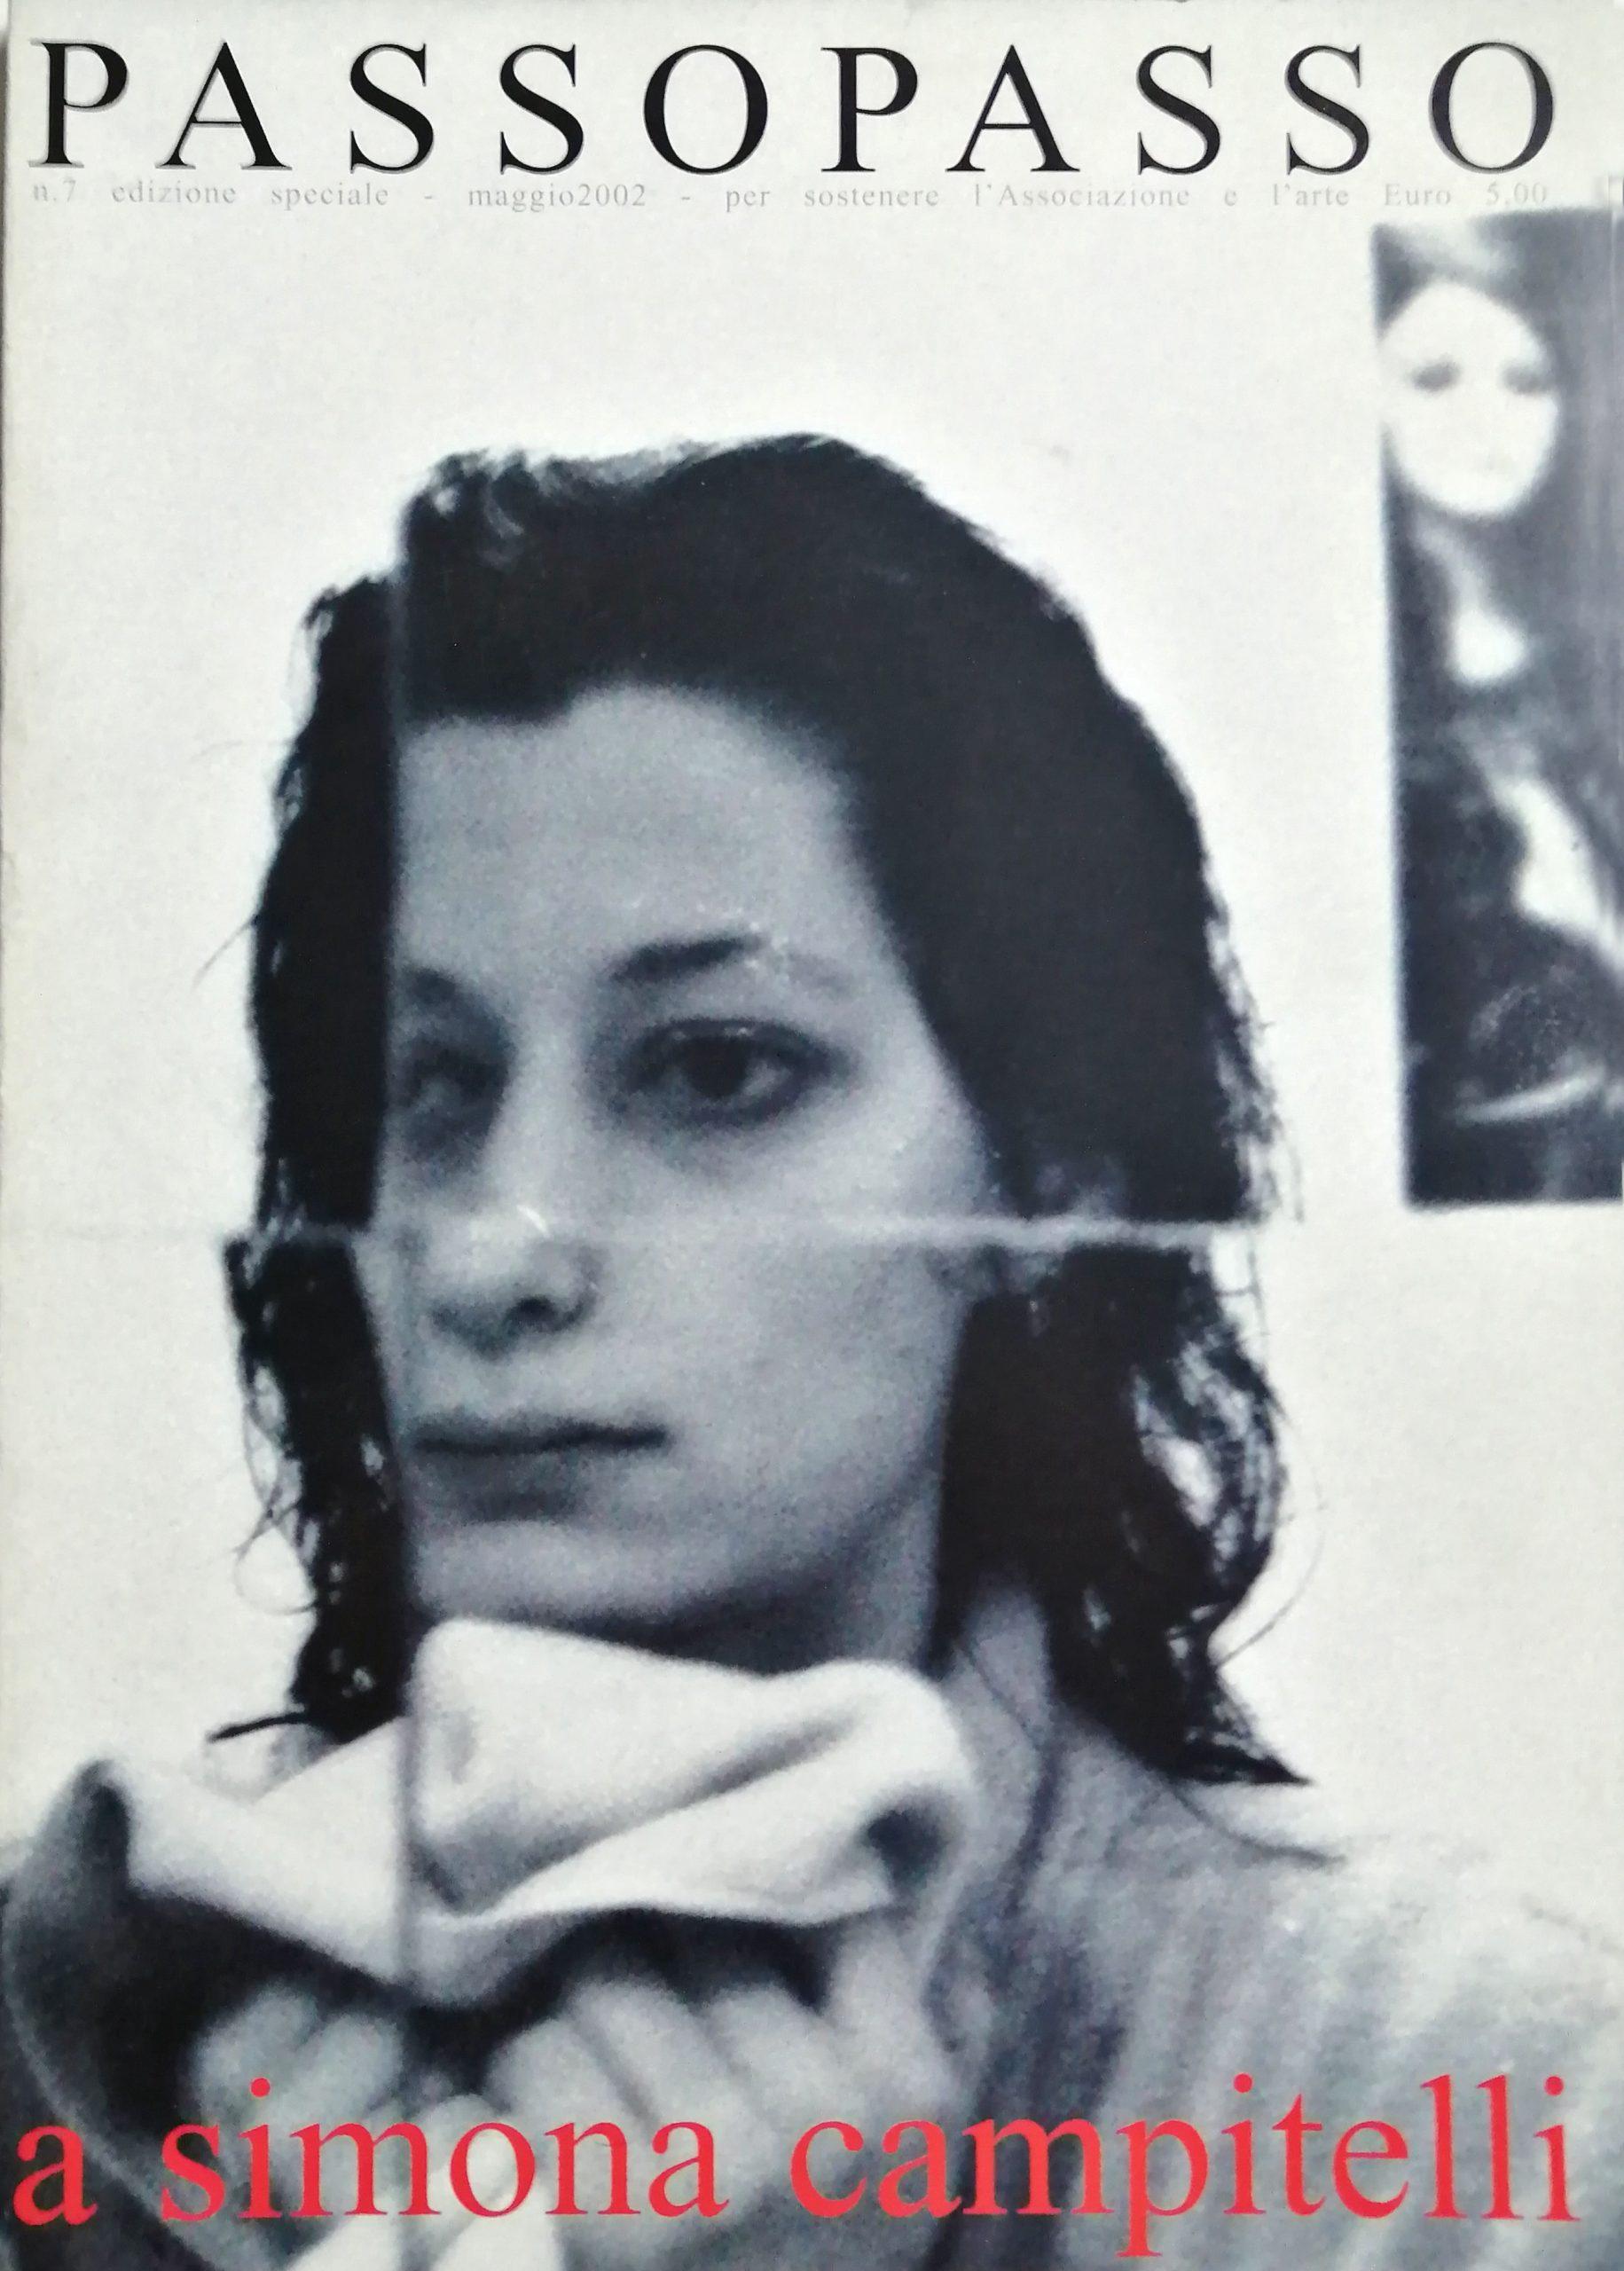 2002 Passopasso 7 rivista catalogo scaled - Bibliography/ Catalogues